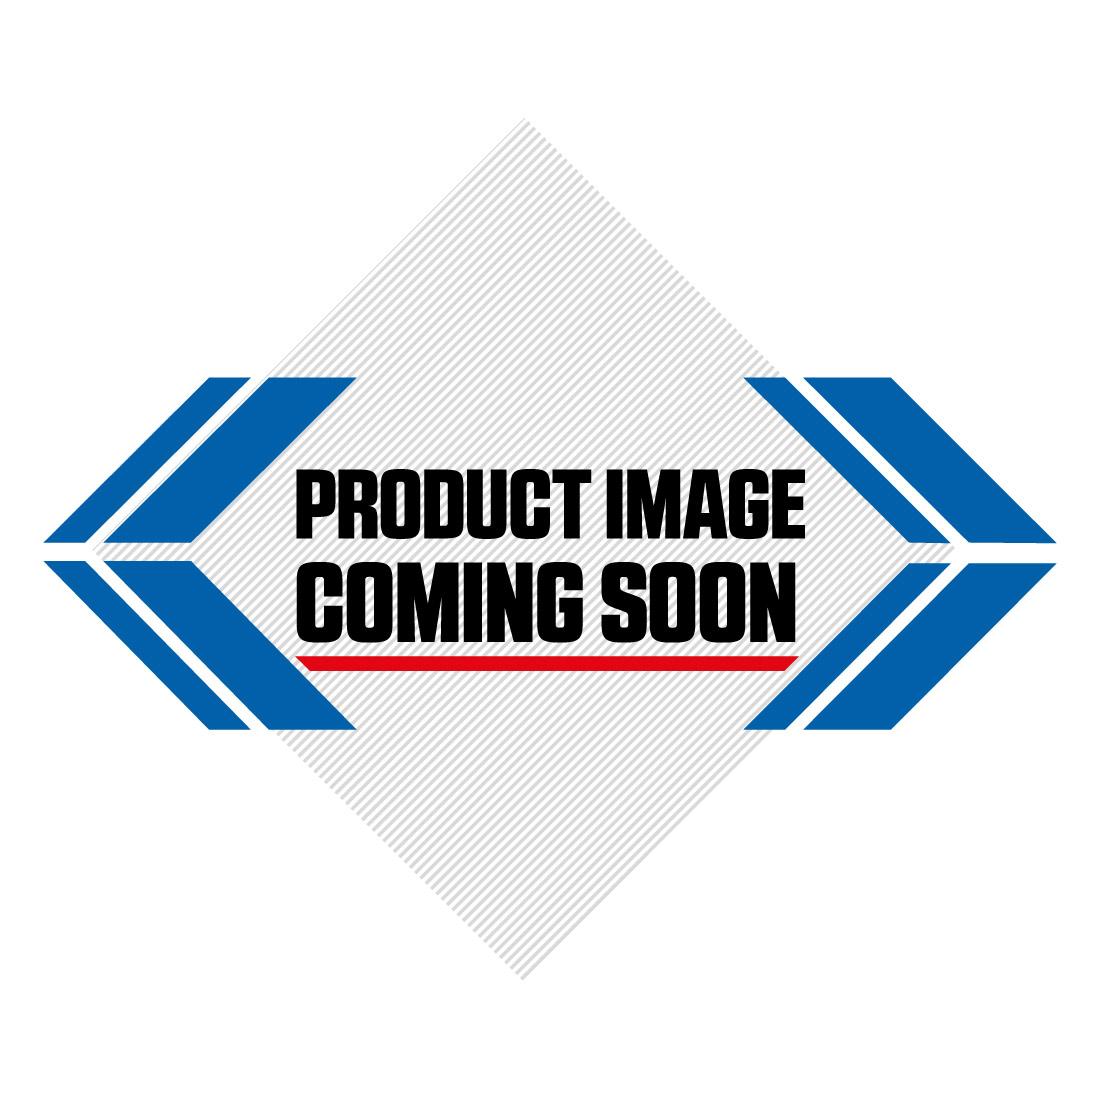 Kit Suzuki RMZ 450 - OEM